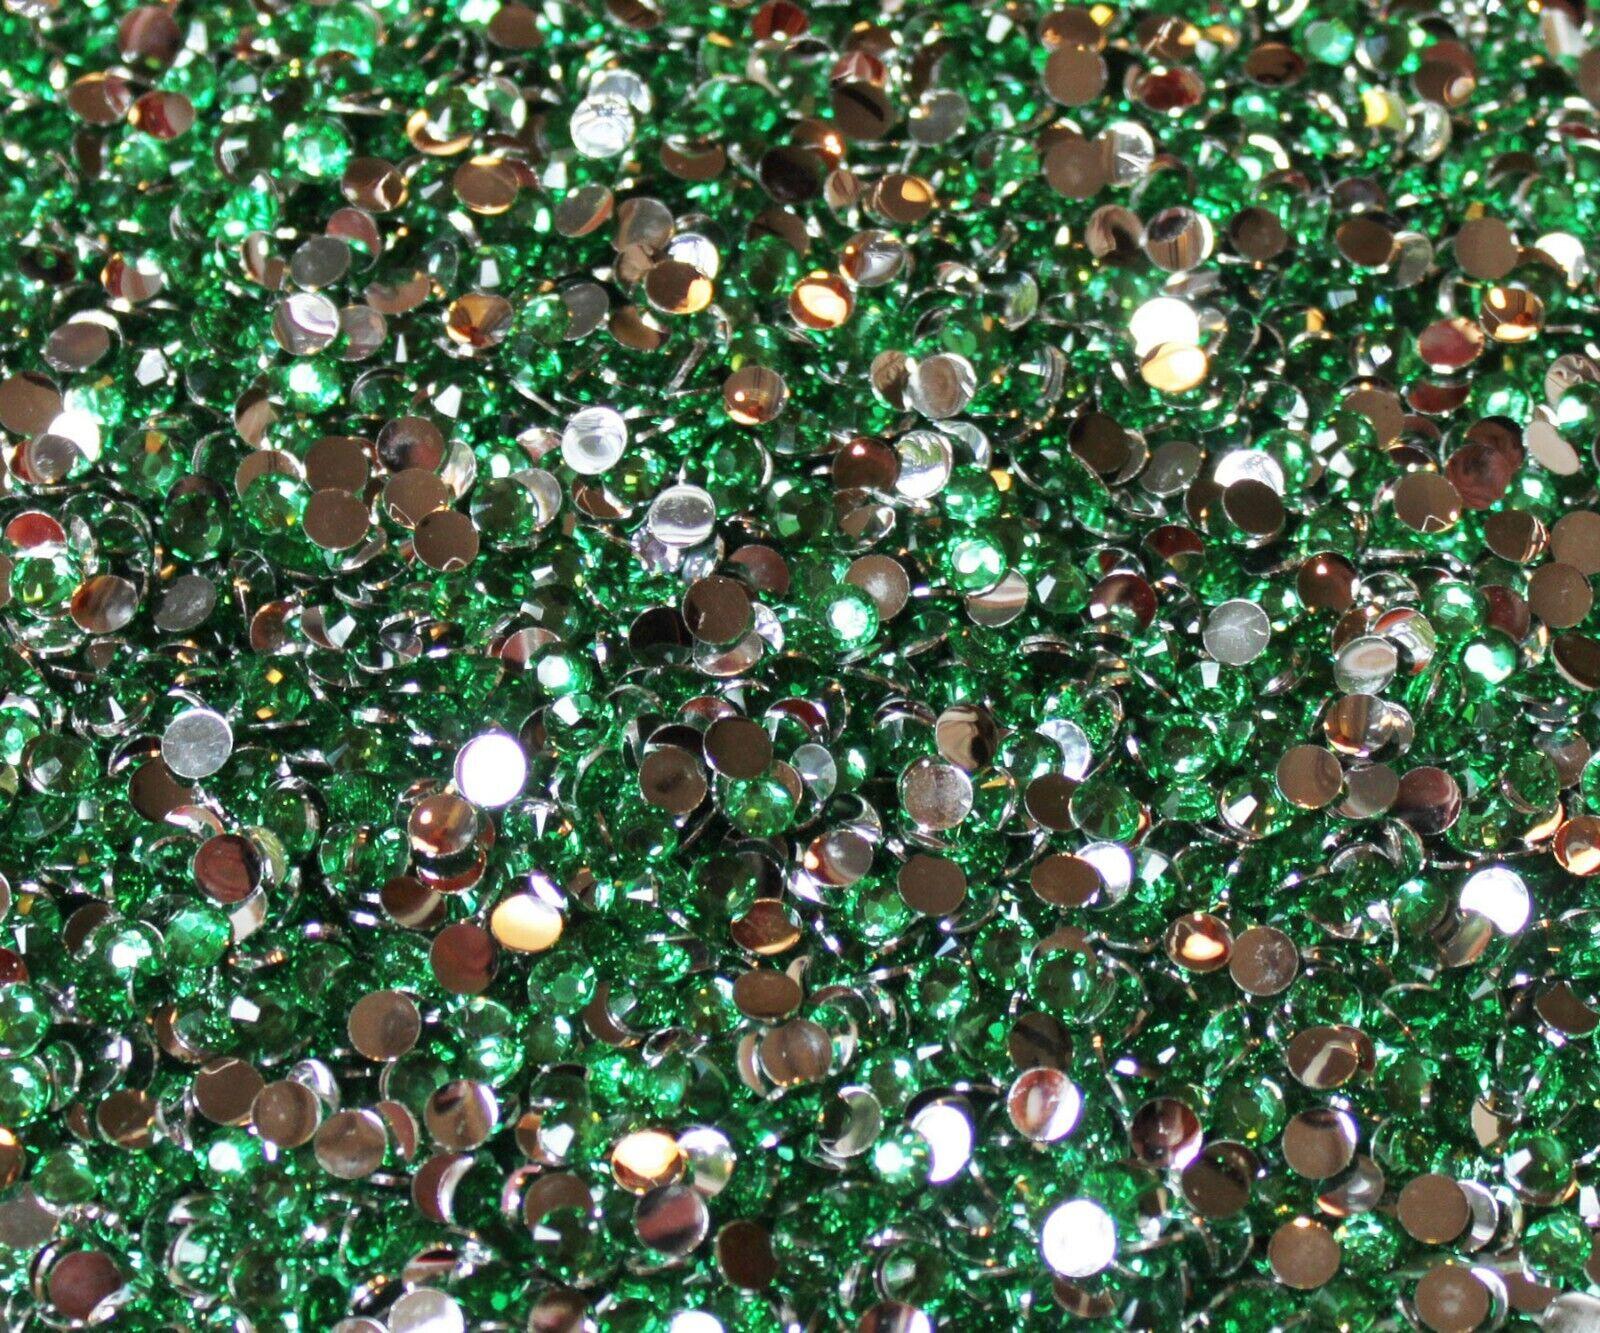 1000 Crystal Flat Back Resin Rhinestones Gems 60 colors, 2mm, 3mm, 4mm, 5mm, 6.5 PEACOCK GREEN